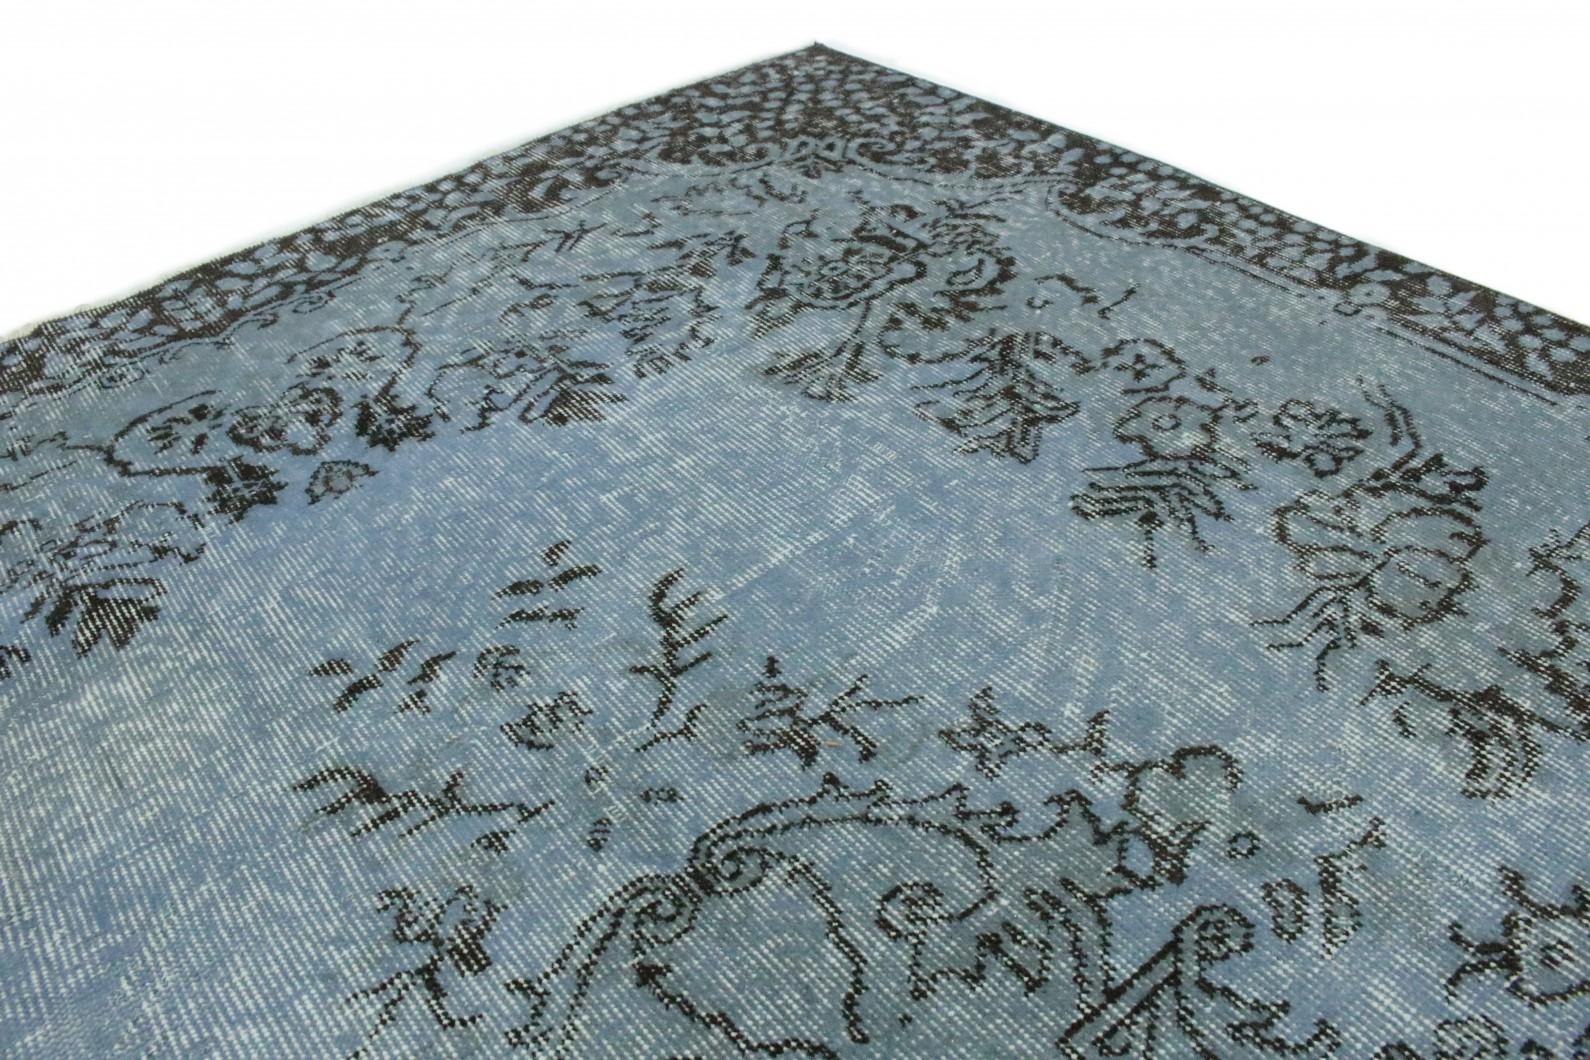 vintage teppich blau grau in 260x170 1011 1187 bei. Black Bedroom Furniture Sets. Home Design Ideas